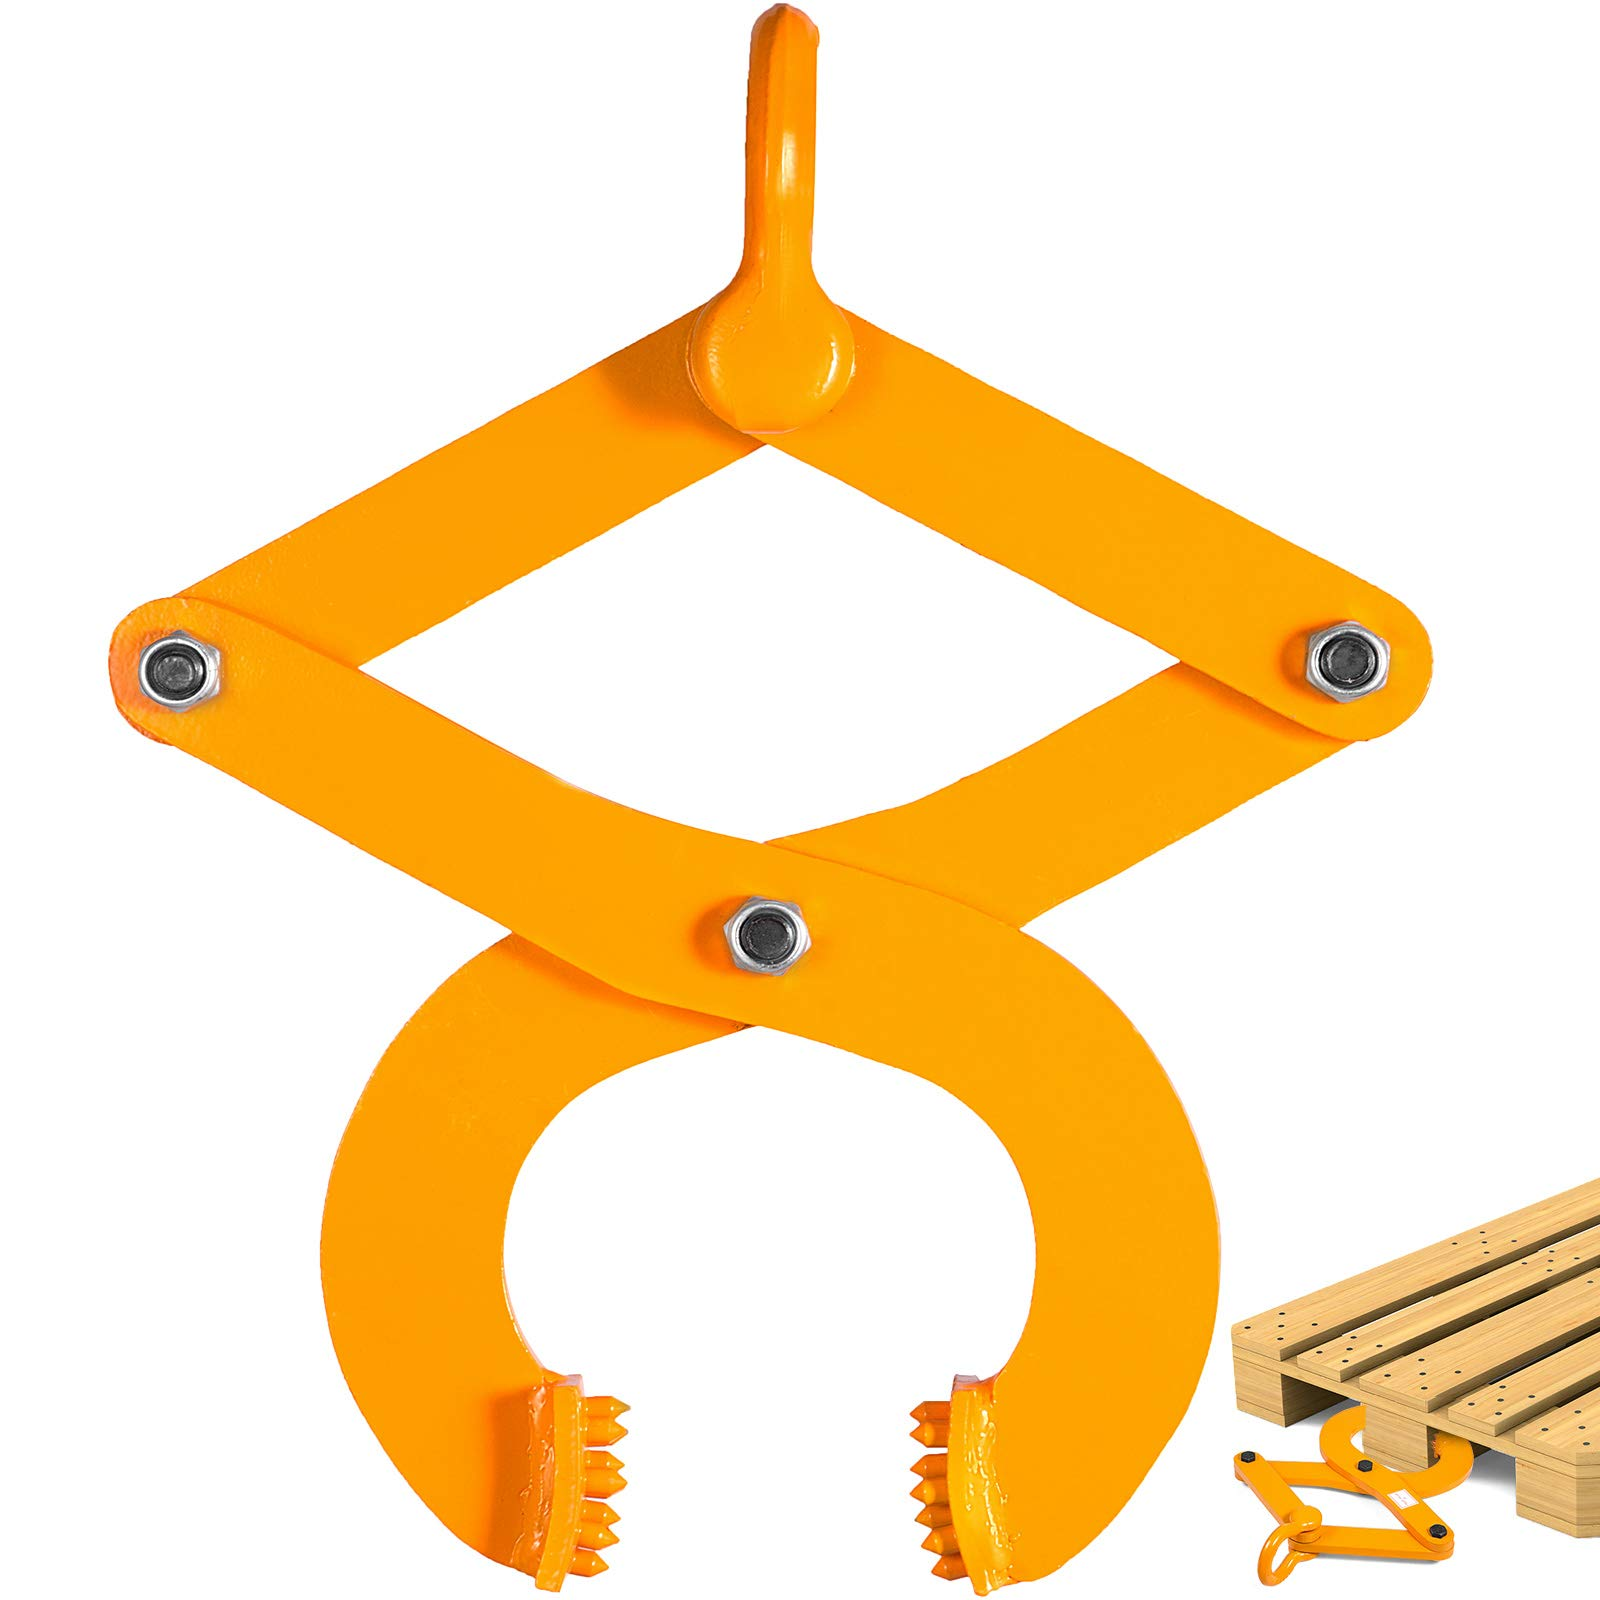 BestEquip 3T Pallet Puller Steel Single Scissor Yellow Pallet Puller Clamp 6614 LBS Capacity Pallet Grabber 6.3 Inch Jaw Opening x 0.5 Inch Jaw Height